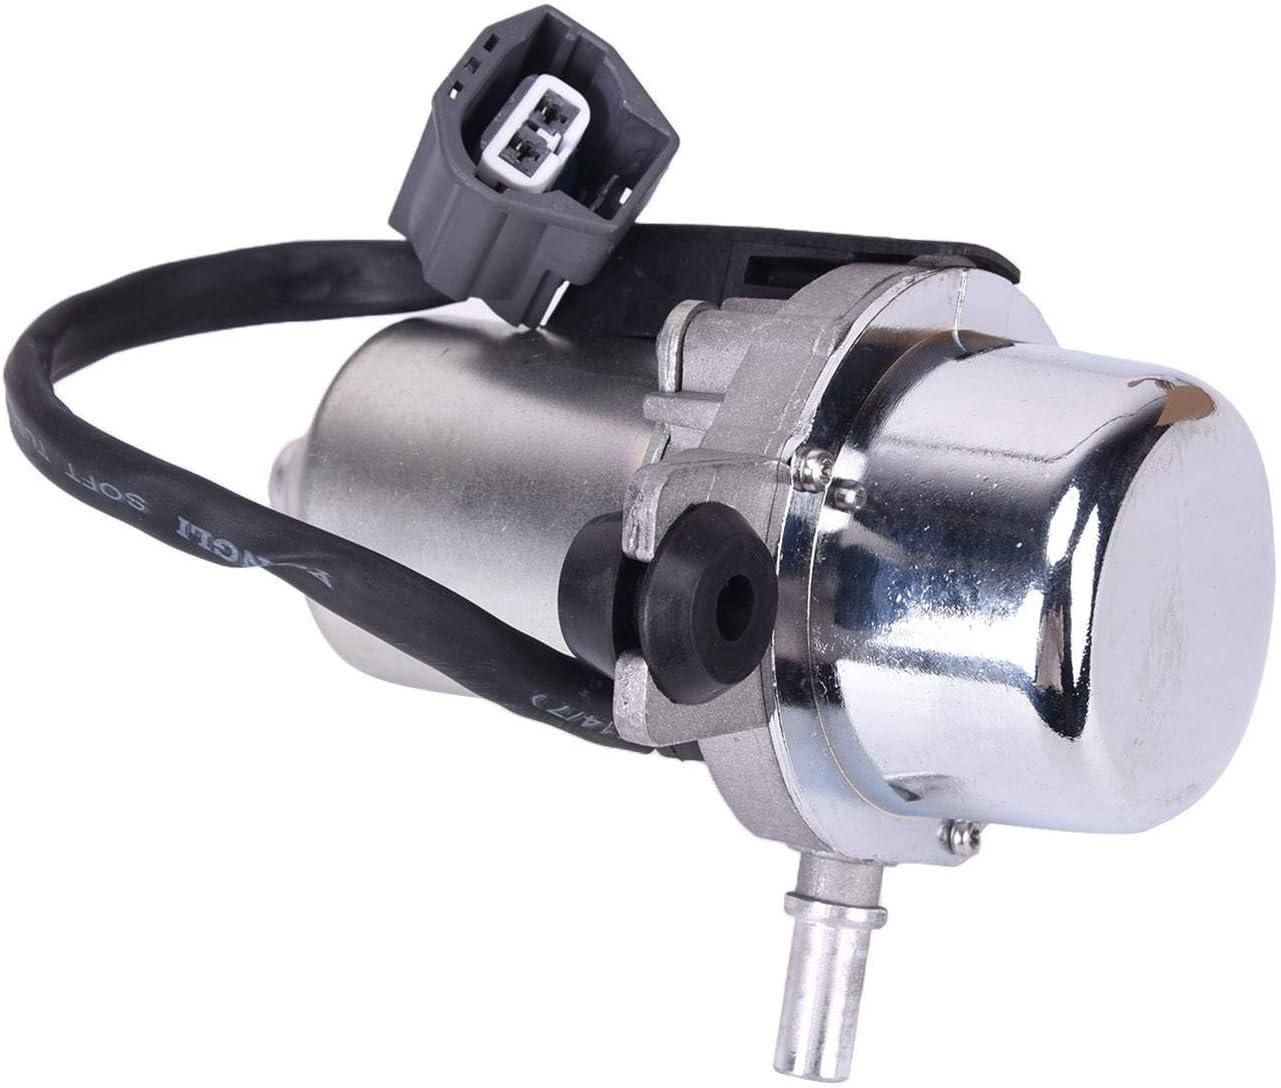 Bapmic 30630398 Brake Vacuum Pump for Volvo C70 S60 S80 V50 V70 XC70 XC90